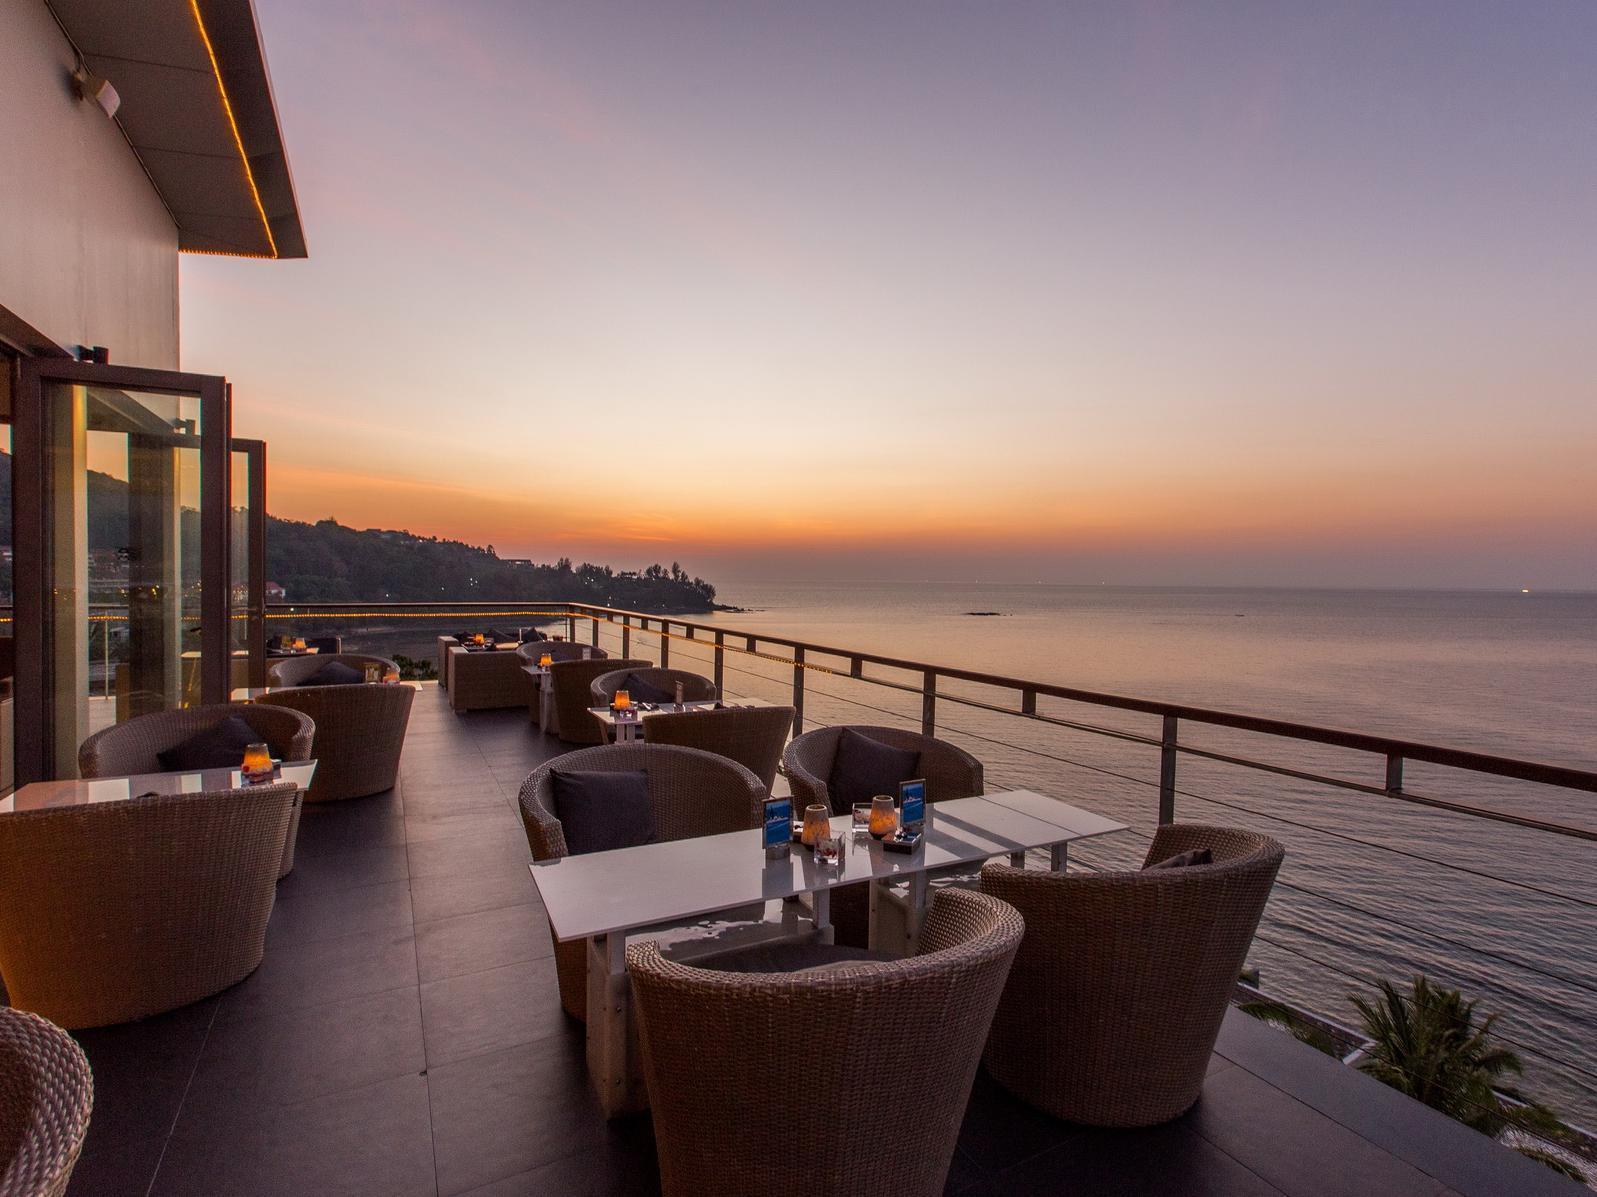 Cape Sienna Phuket Hotel and Villas11